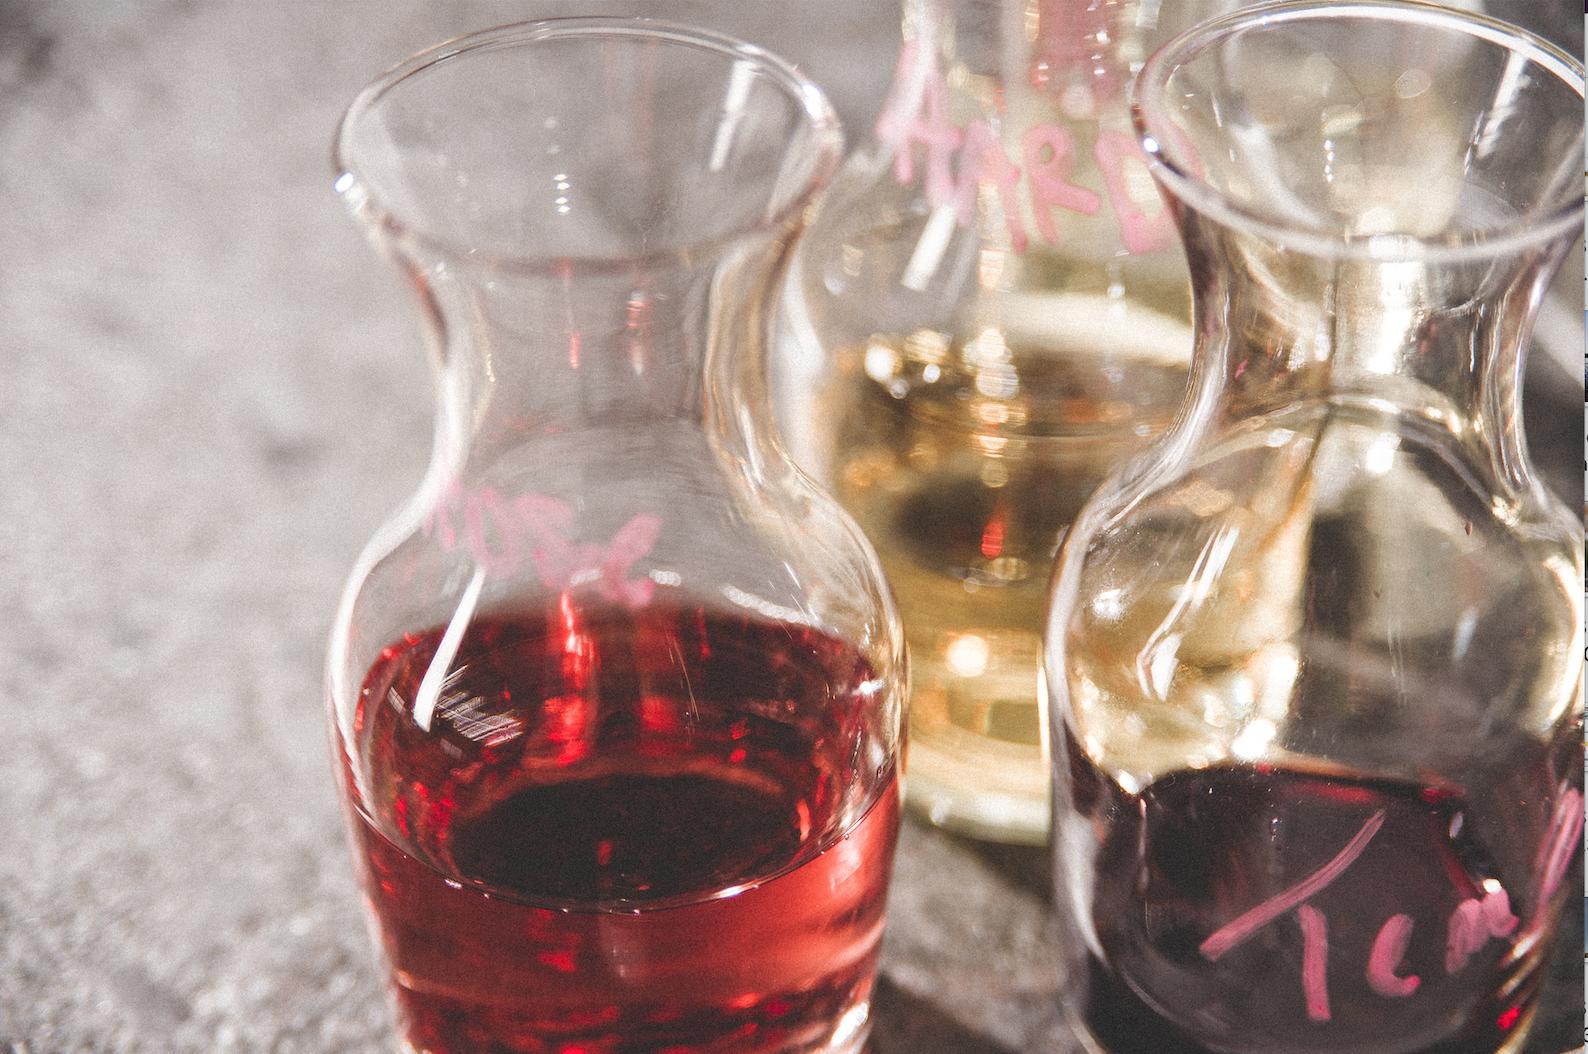 wine samples in idaho